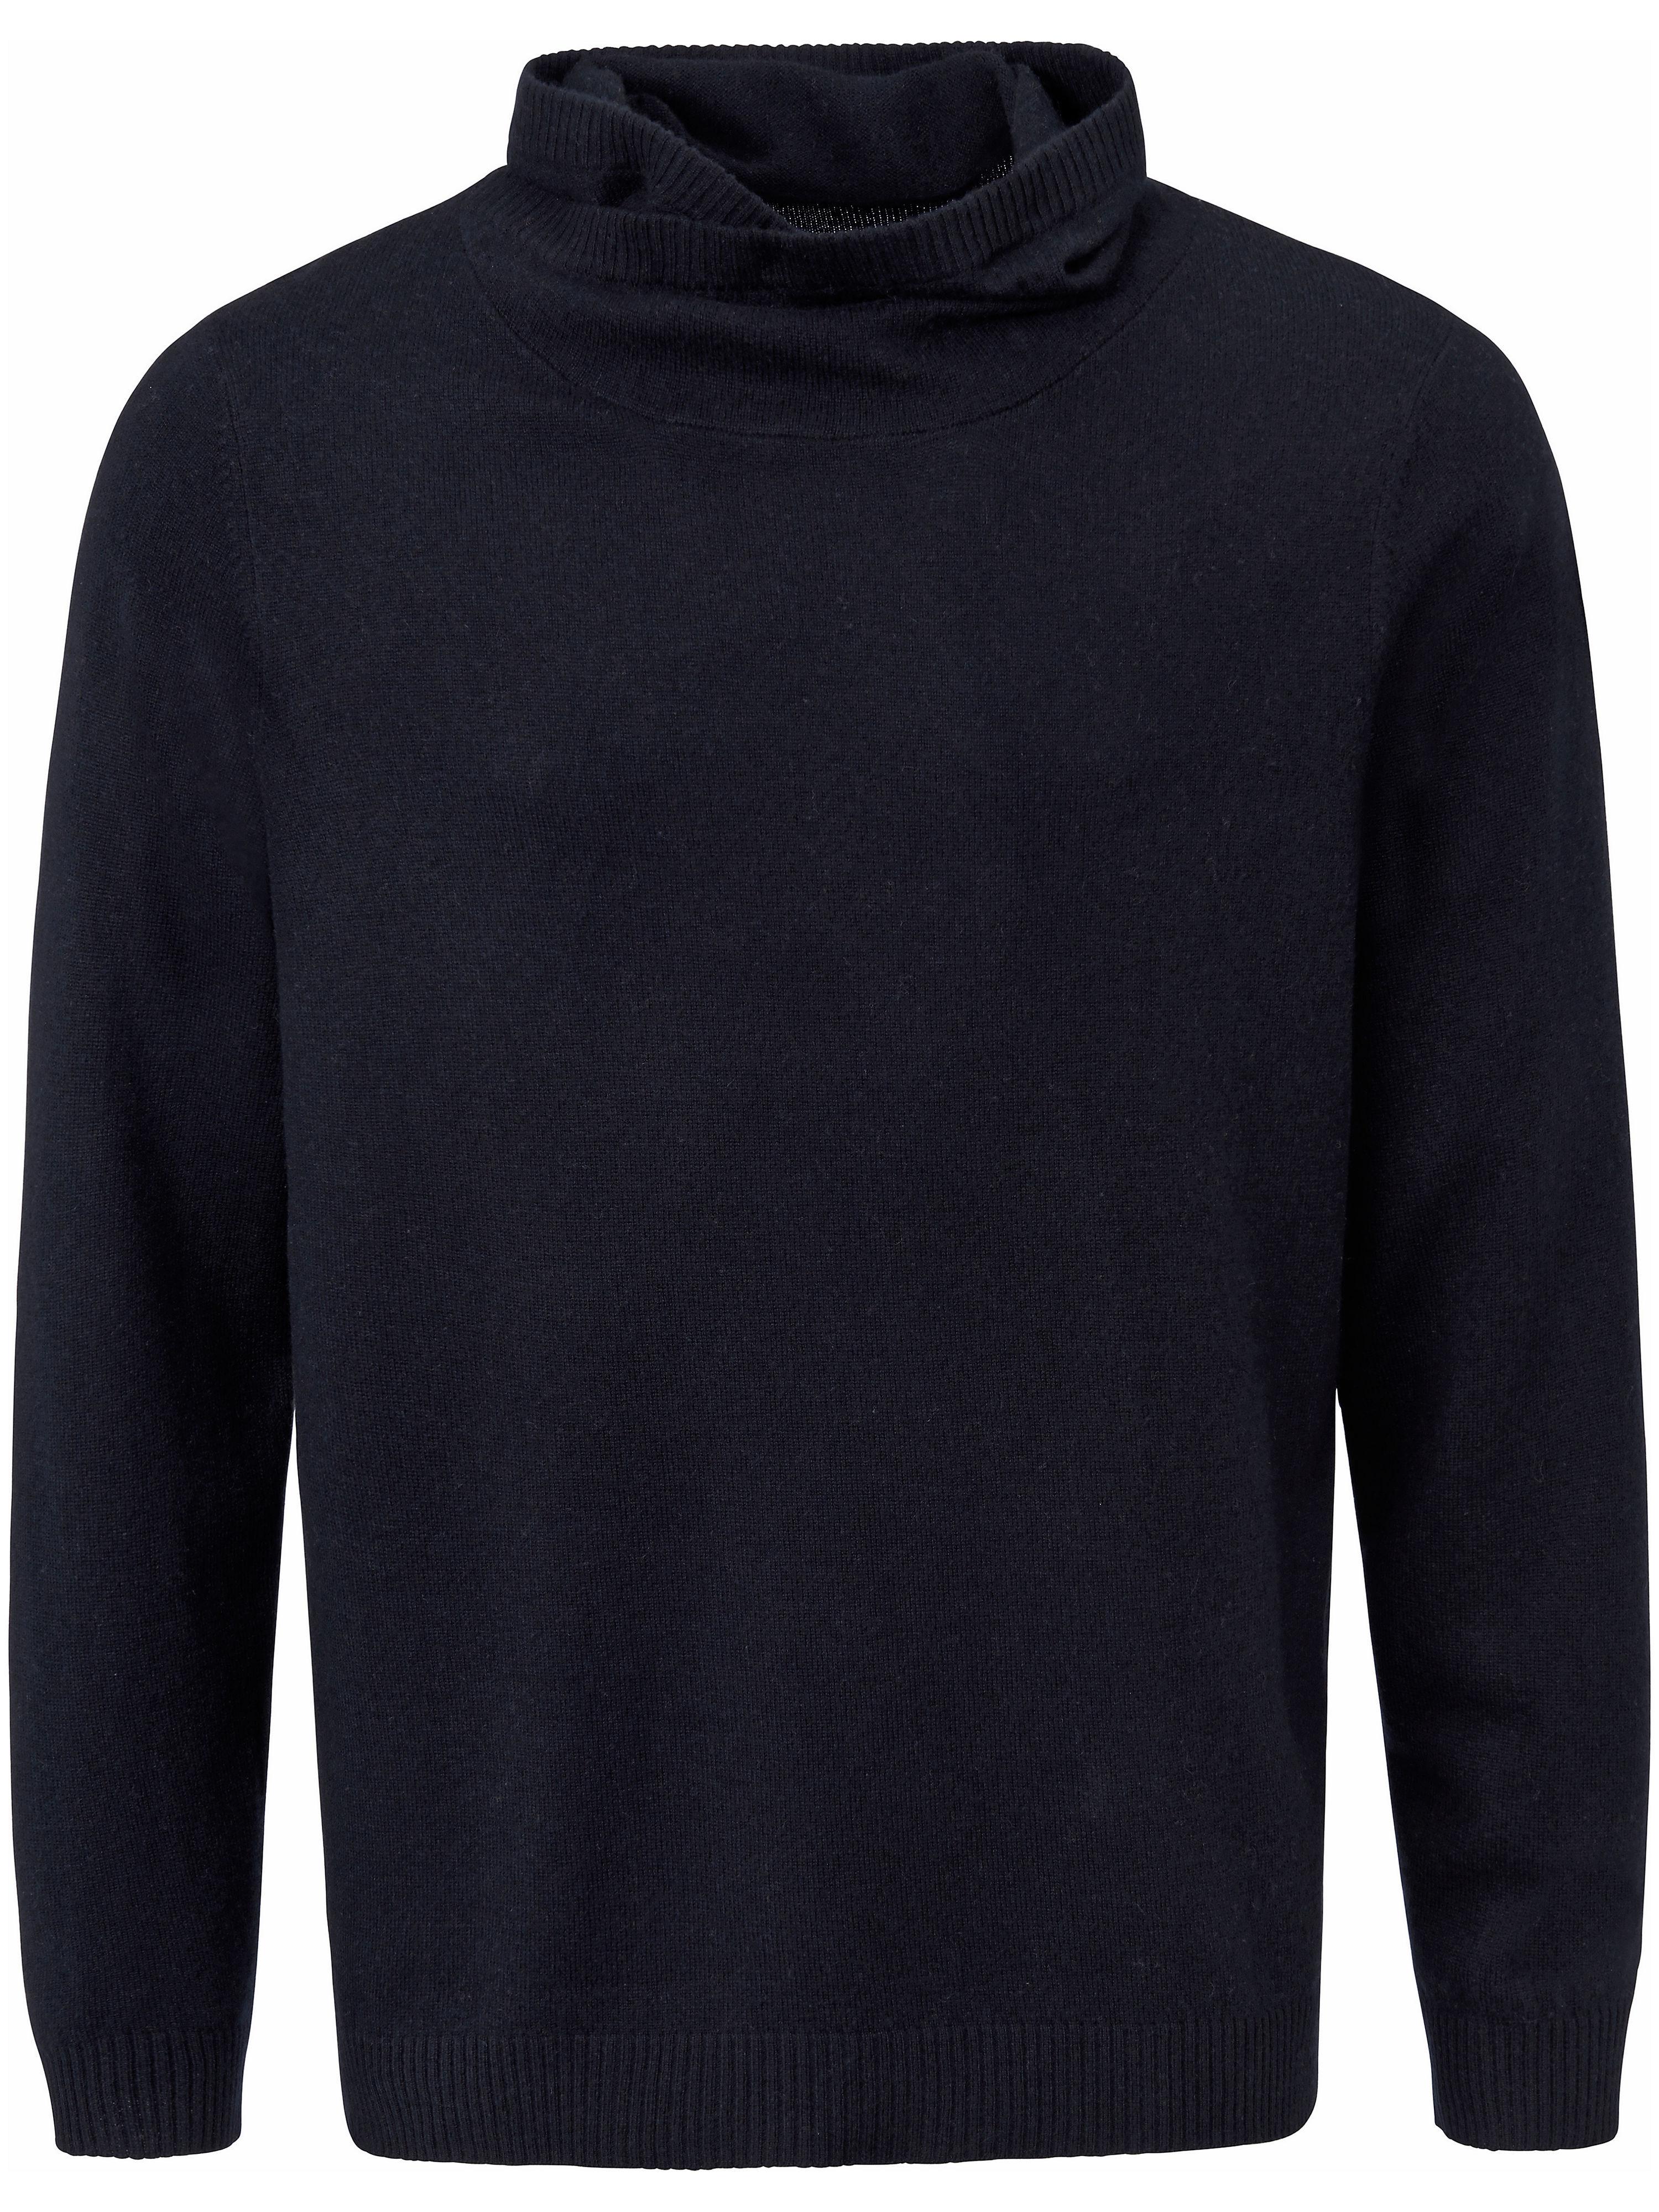 Louis Sayn Stickad tröja vid polokrage från Louis Sayn blå